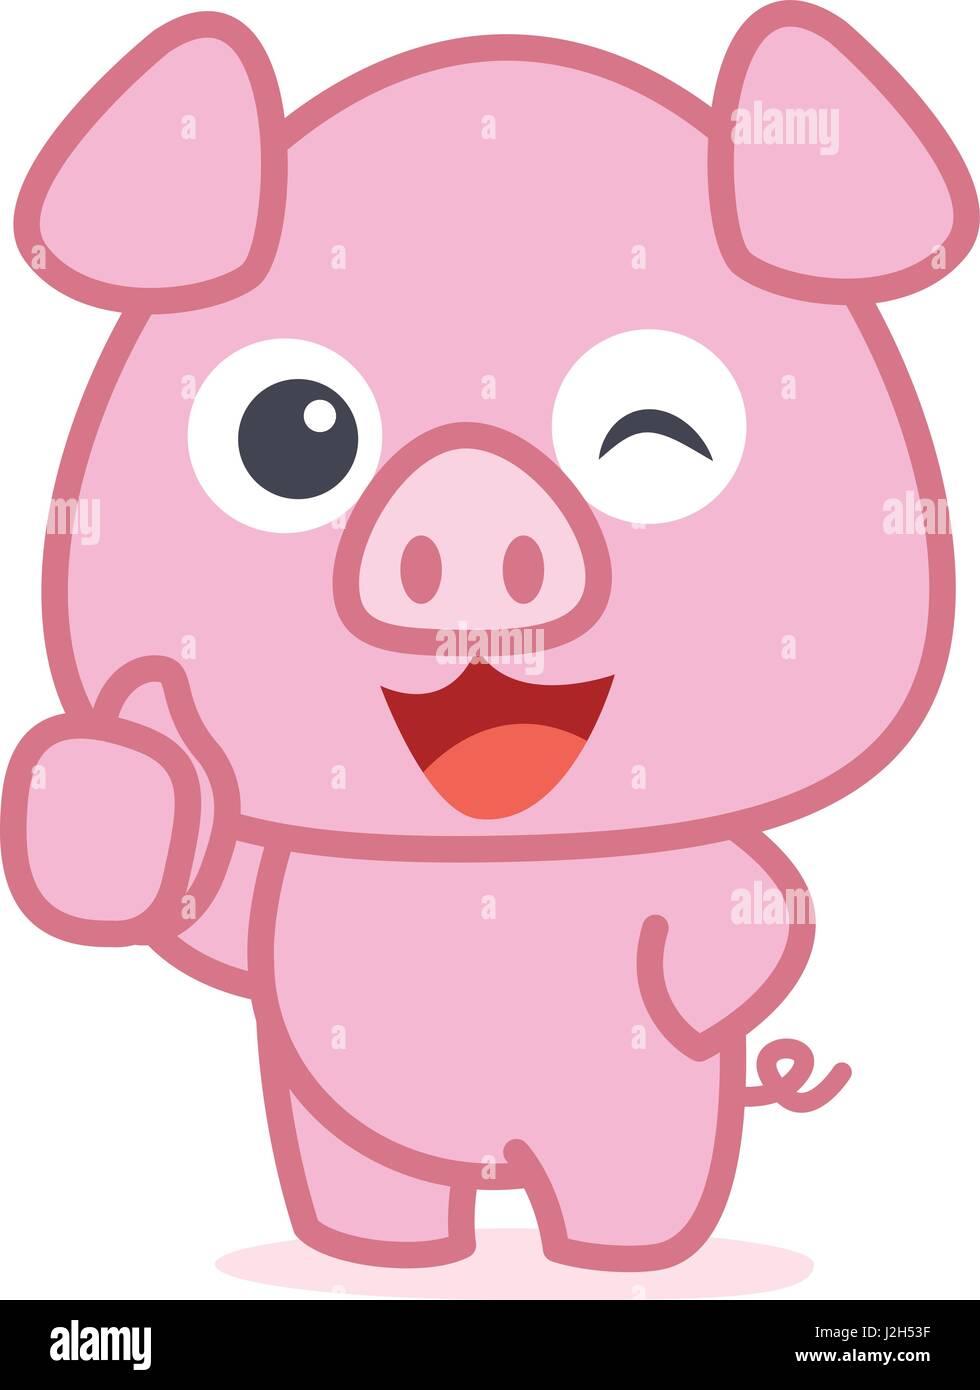 Character of cute pig cartoon stock vector art - Pig wallpaper cartoon pig ...